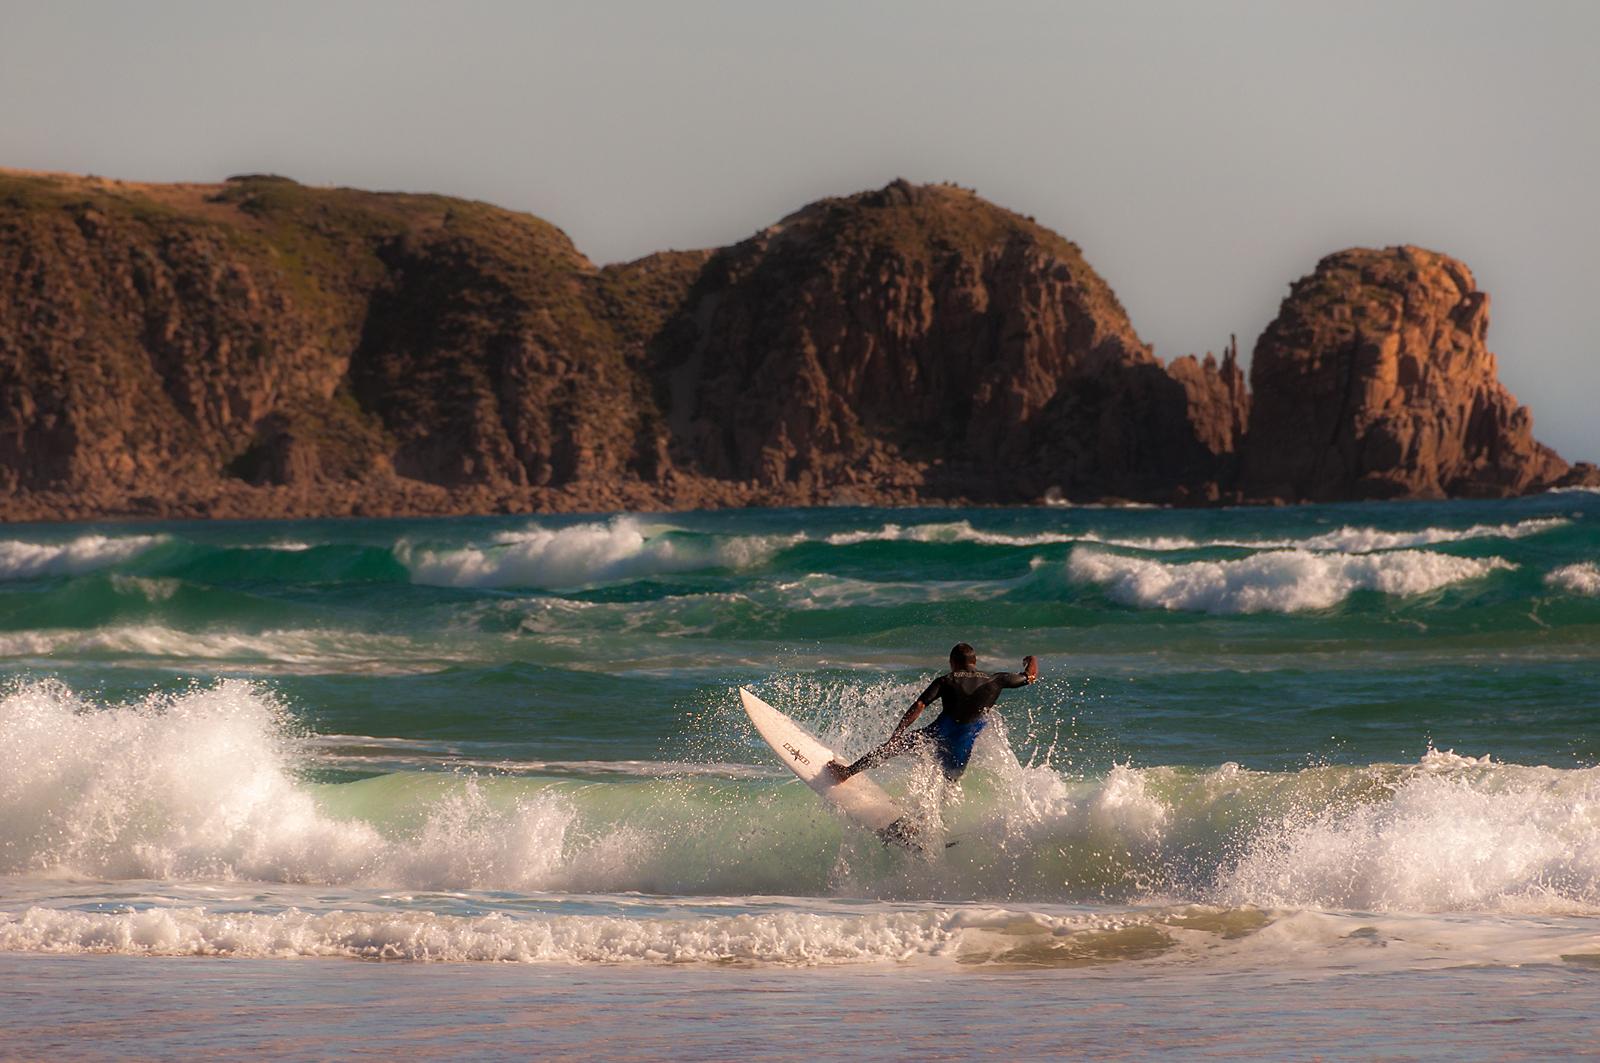 Surfing @Cape Woolamai...